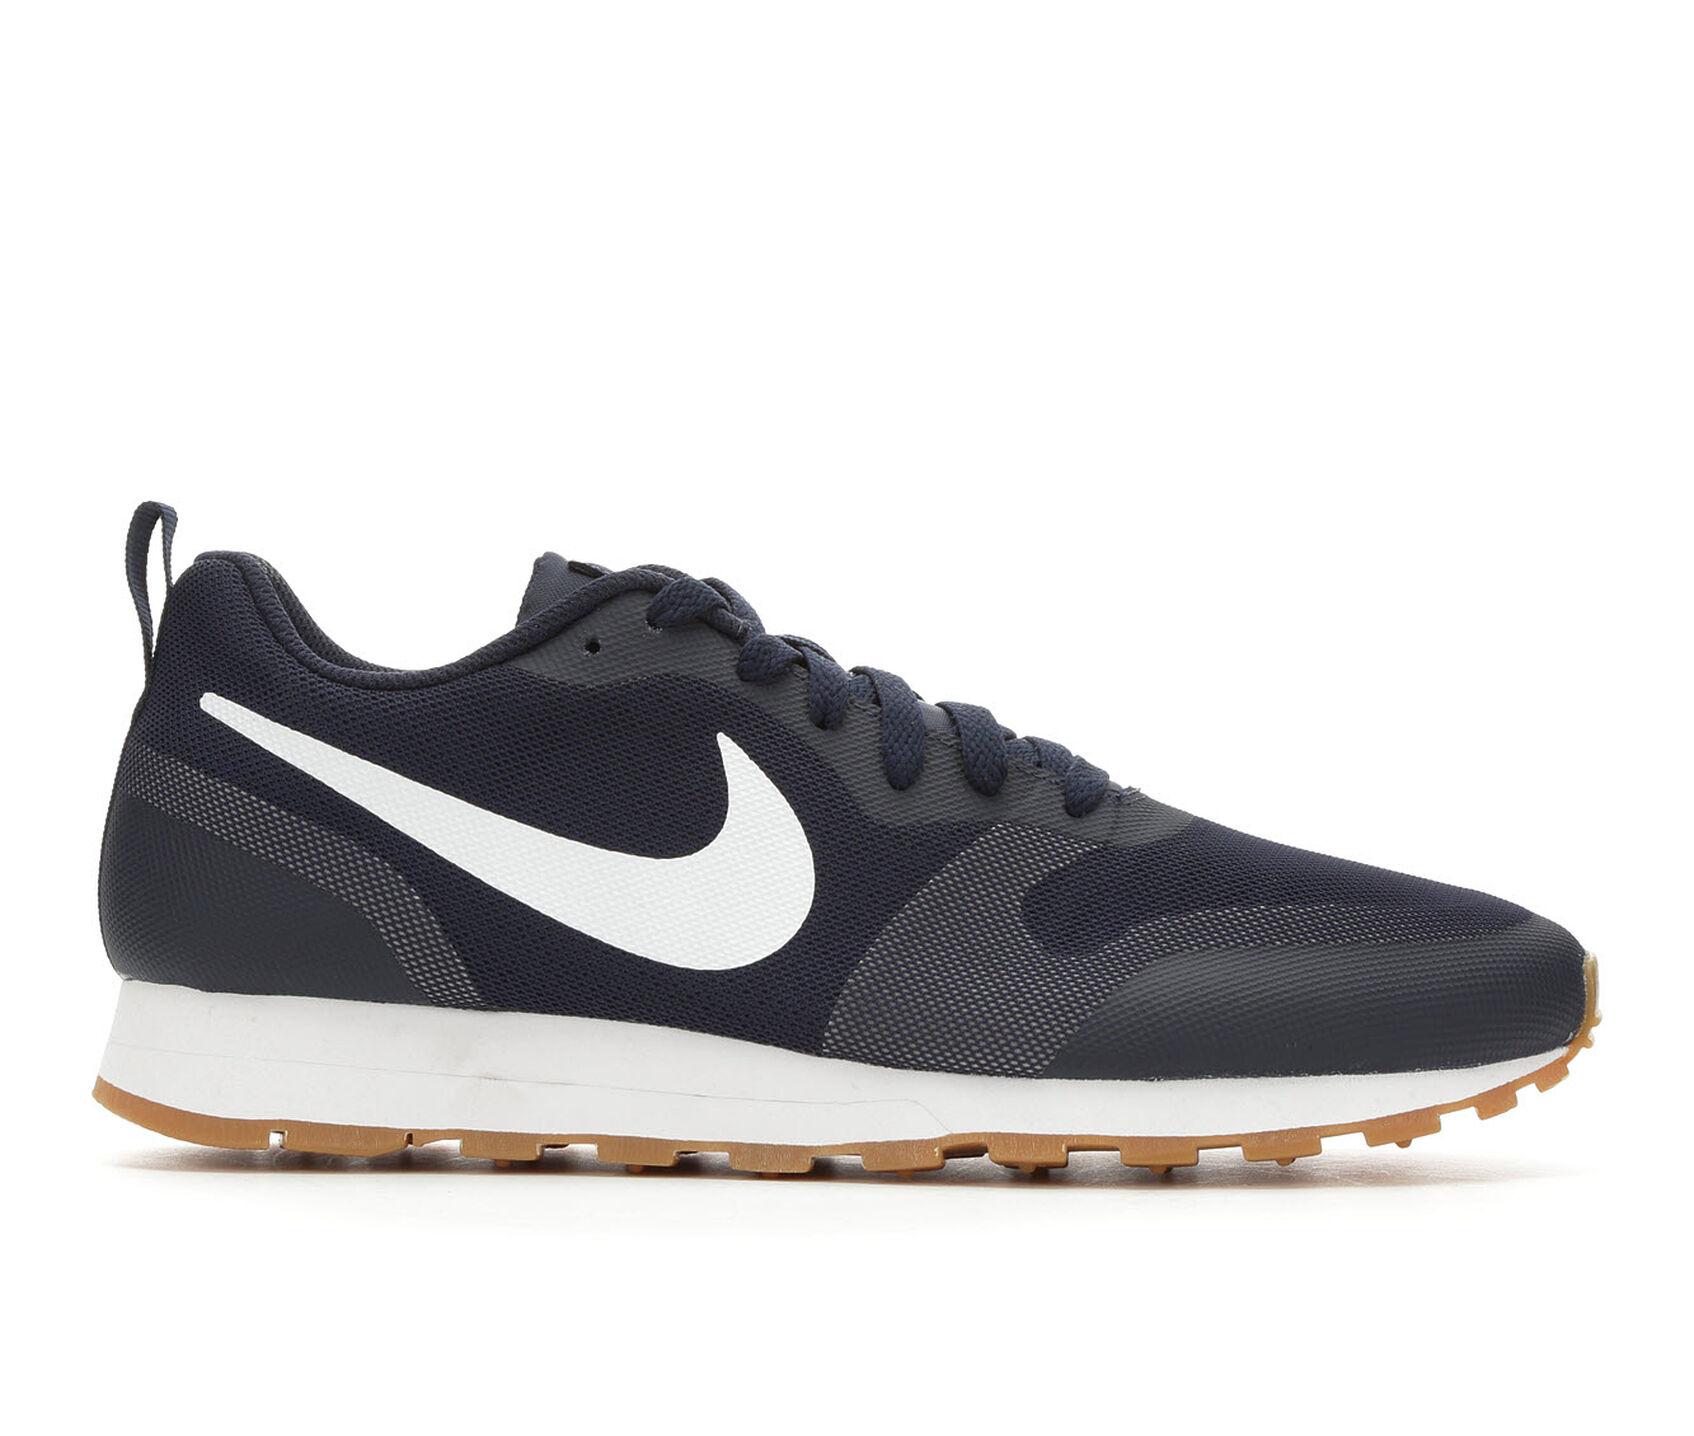 816d7112b63 Men's Nike MD Runner 2 19 Sneakers | Shoe Carnival